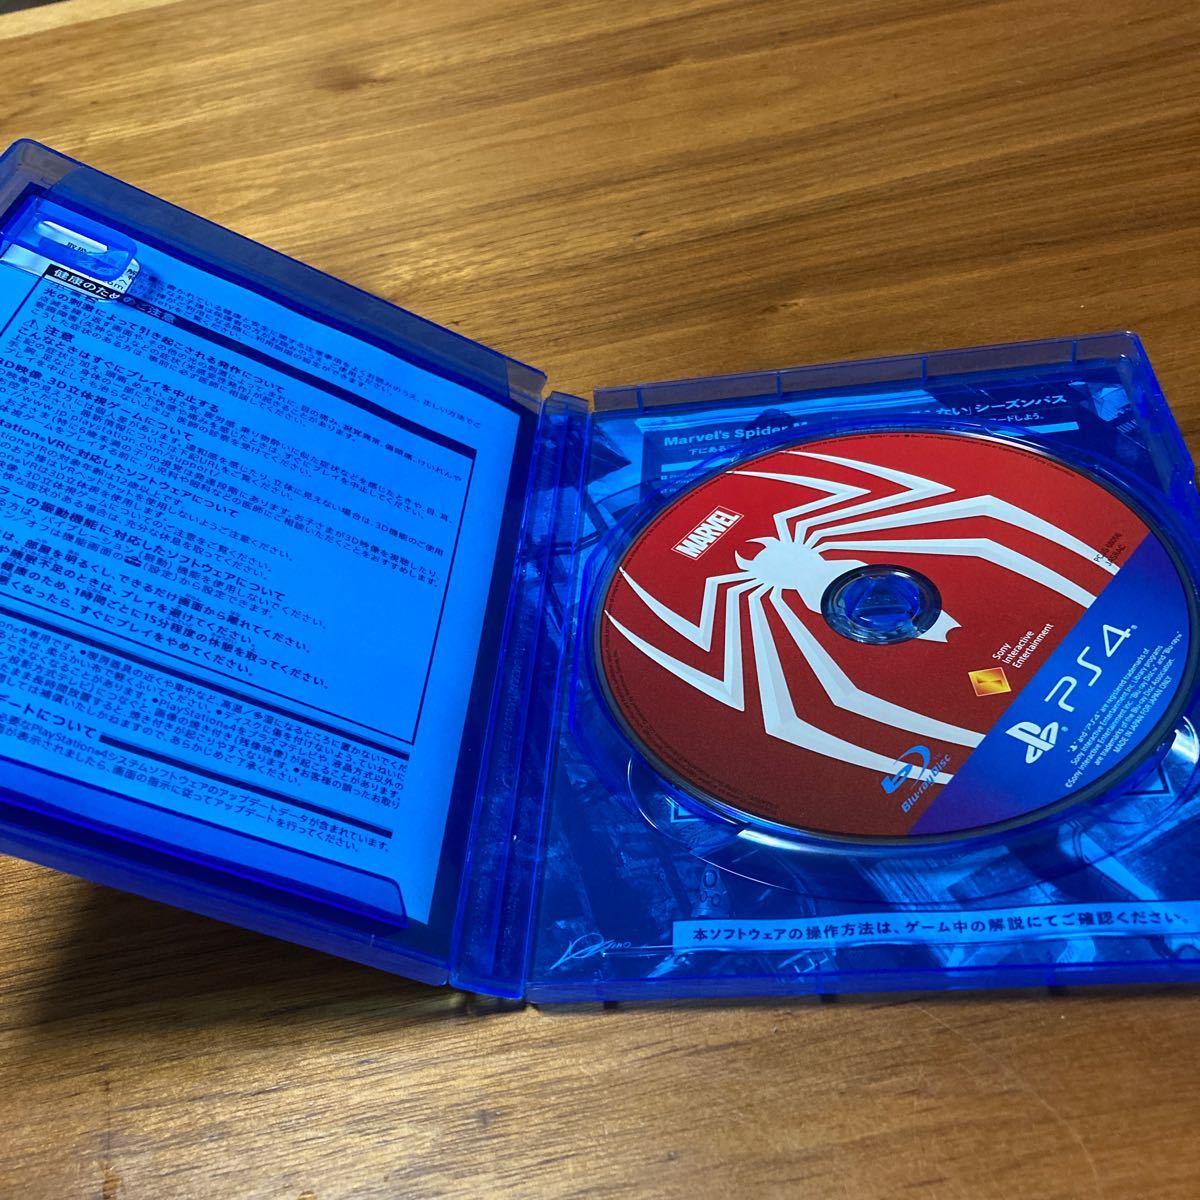 【PS4】スパイダーマンゲームソフト